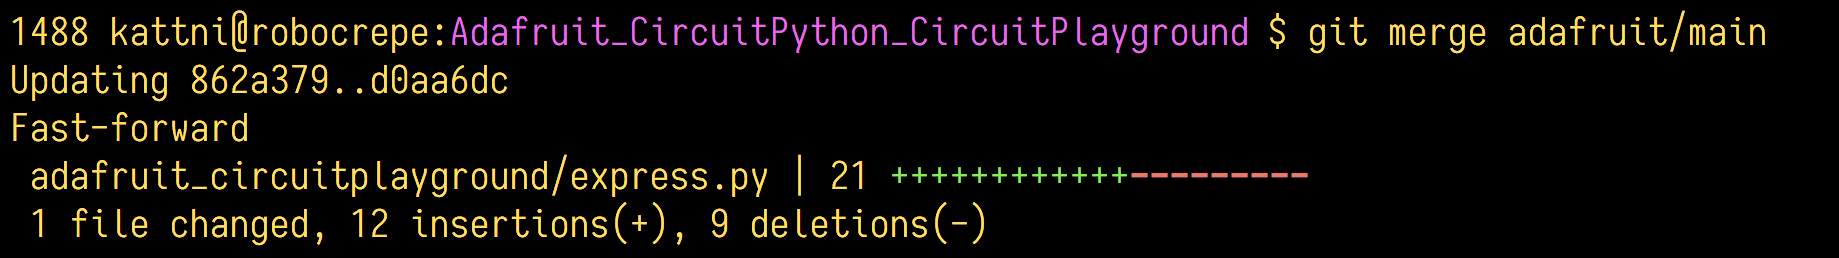 circuitpython_GitUpdateGitMergeAdafruitMain.png